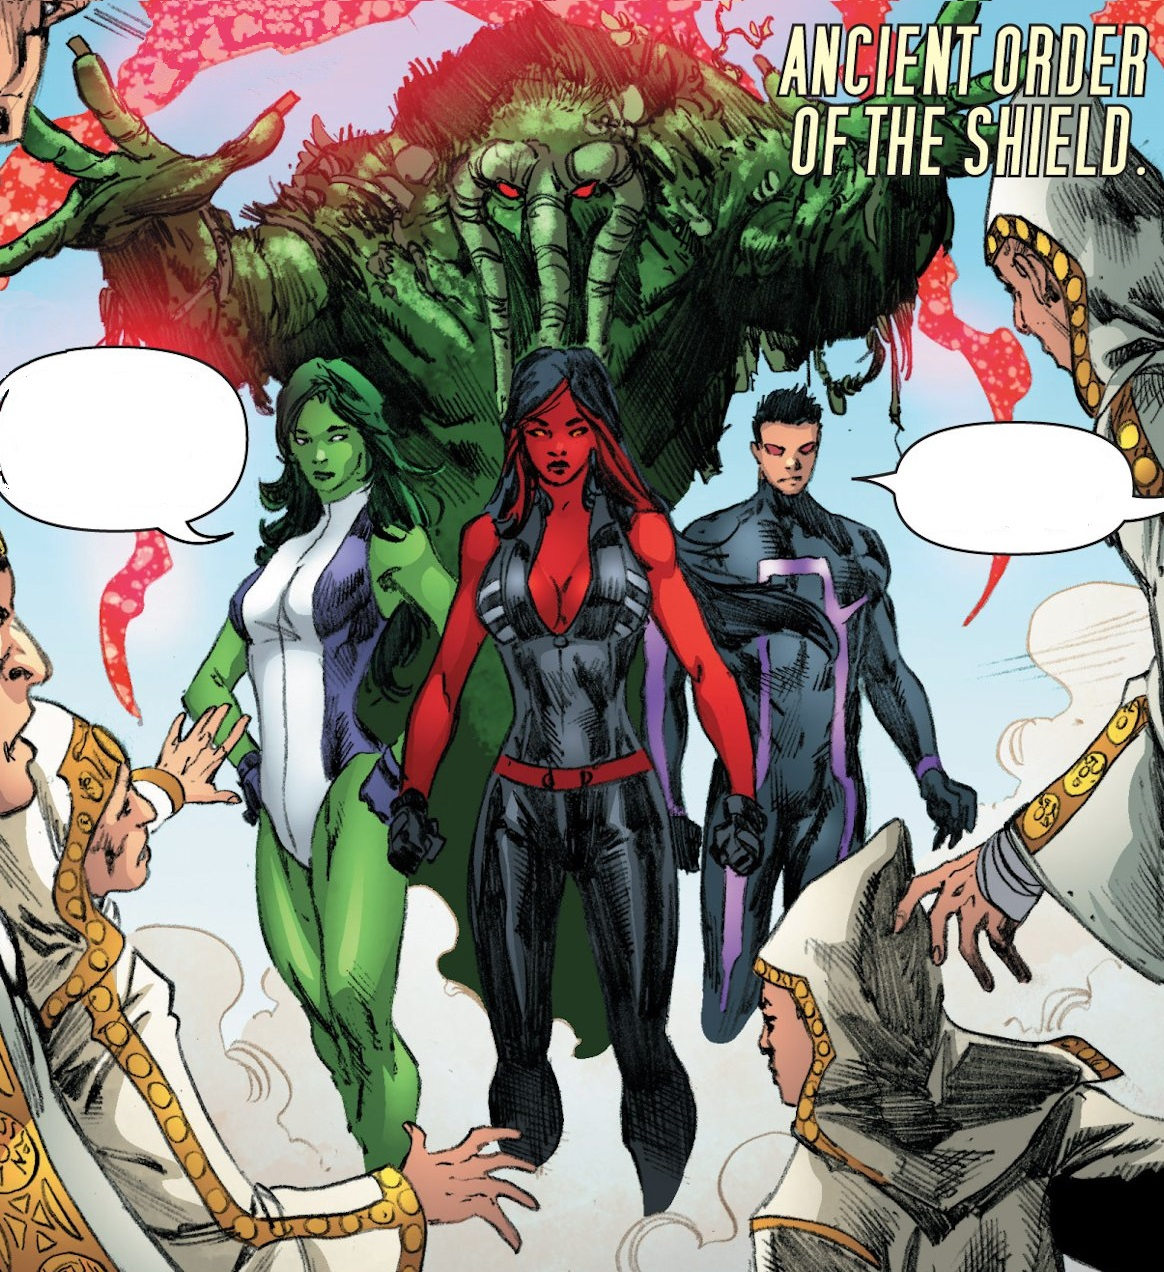 Brotherhood of the Shield (Earth-616) from Red She-Hulk Vol 1 67 001.jpg